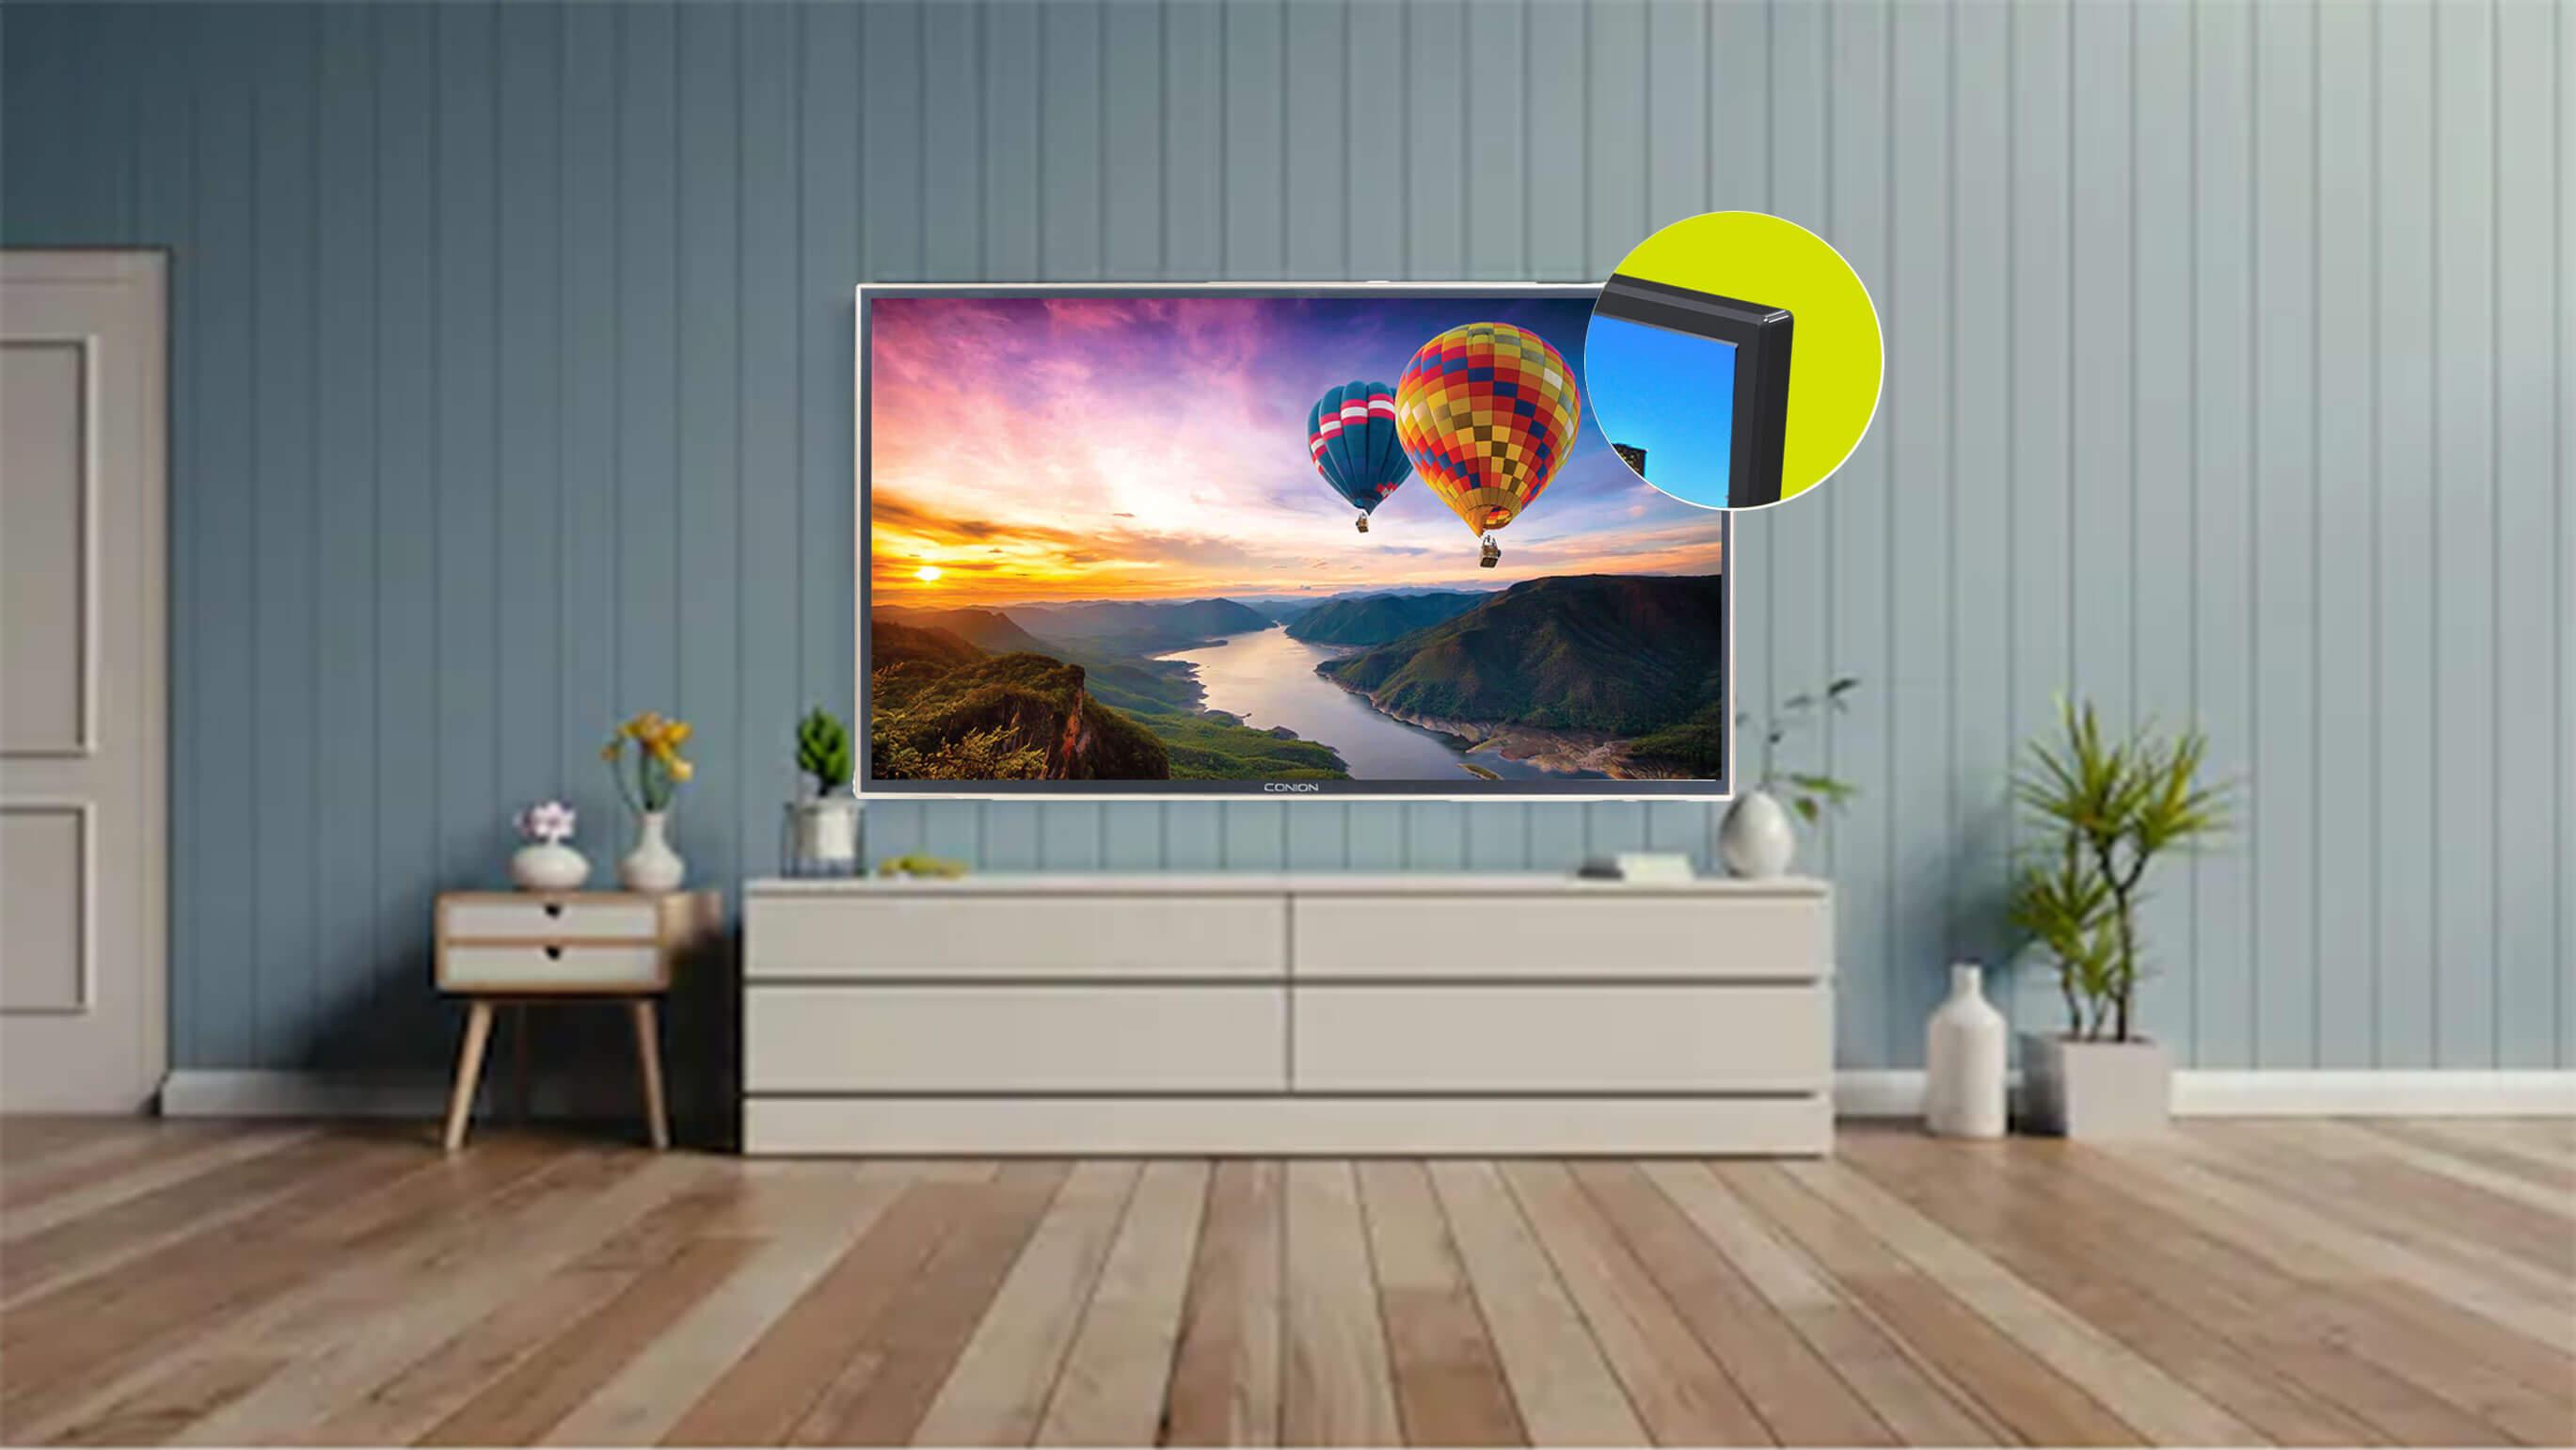 STYLISH NARROW BEZEL Conion BEZ-32XB500G HD LED Television